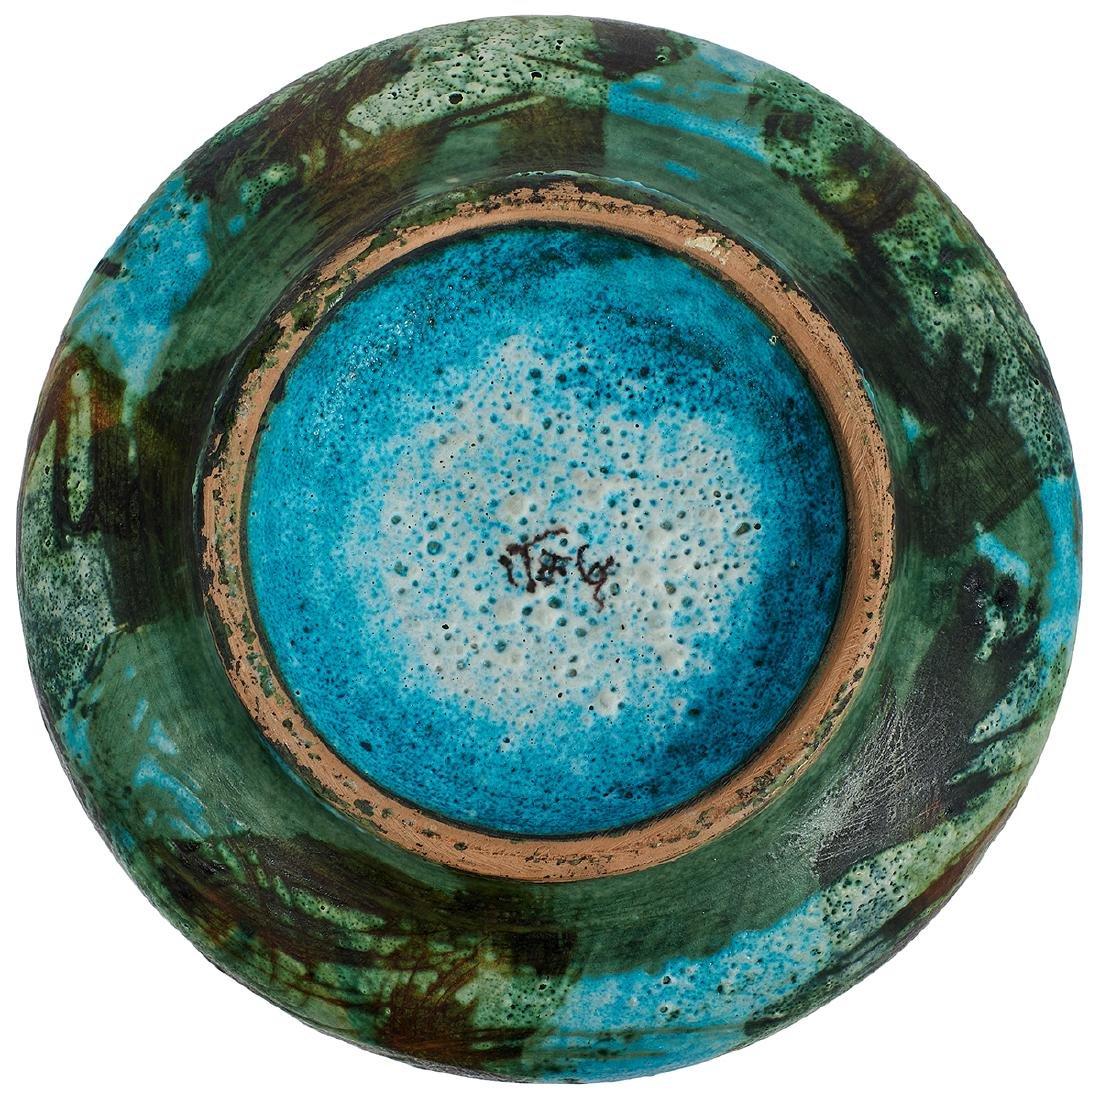 Aldo Bagni for Raymor 'Sea Garden' vase - 2